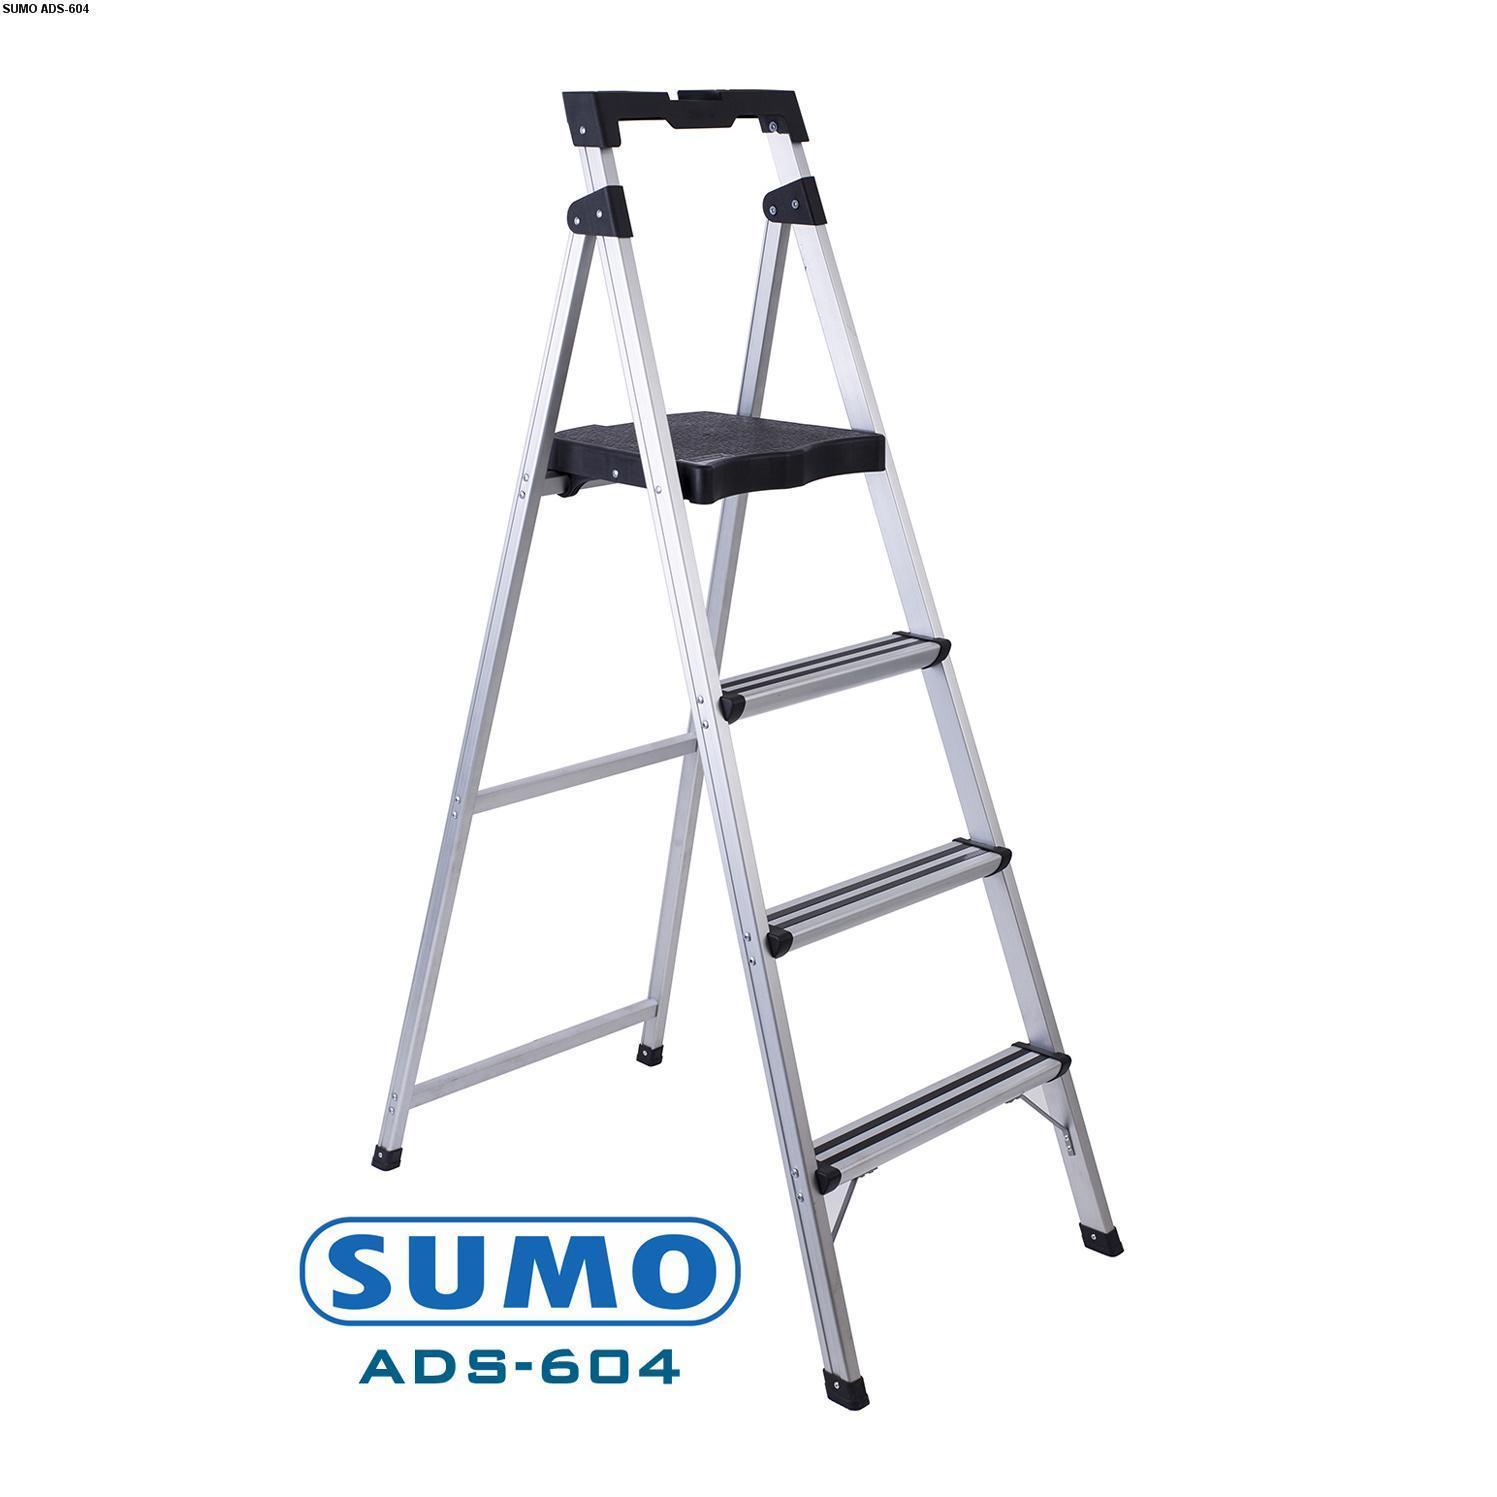 Thang ghế Sumo ADS-604 (4 bậc)